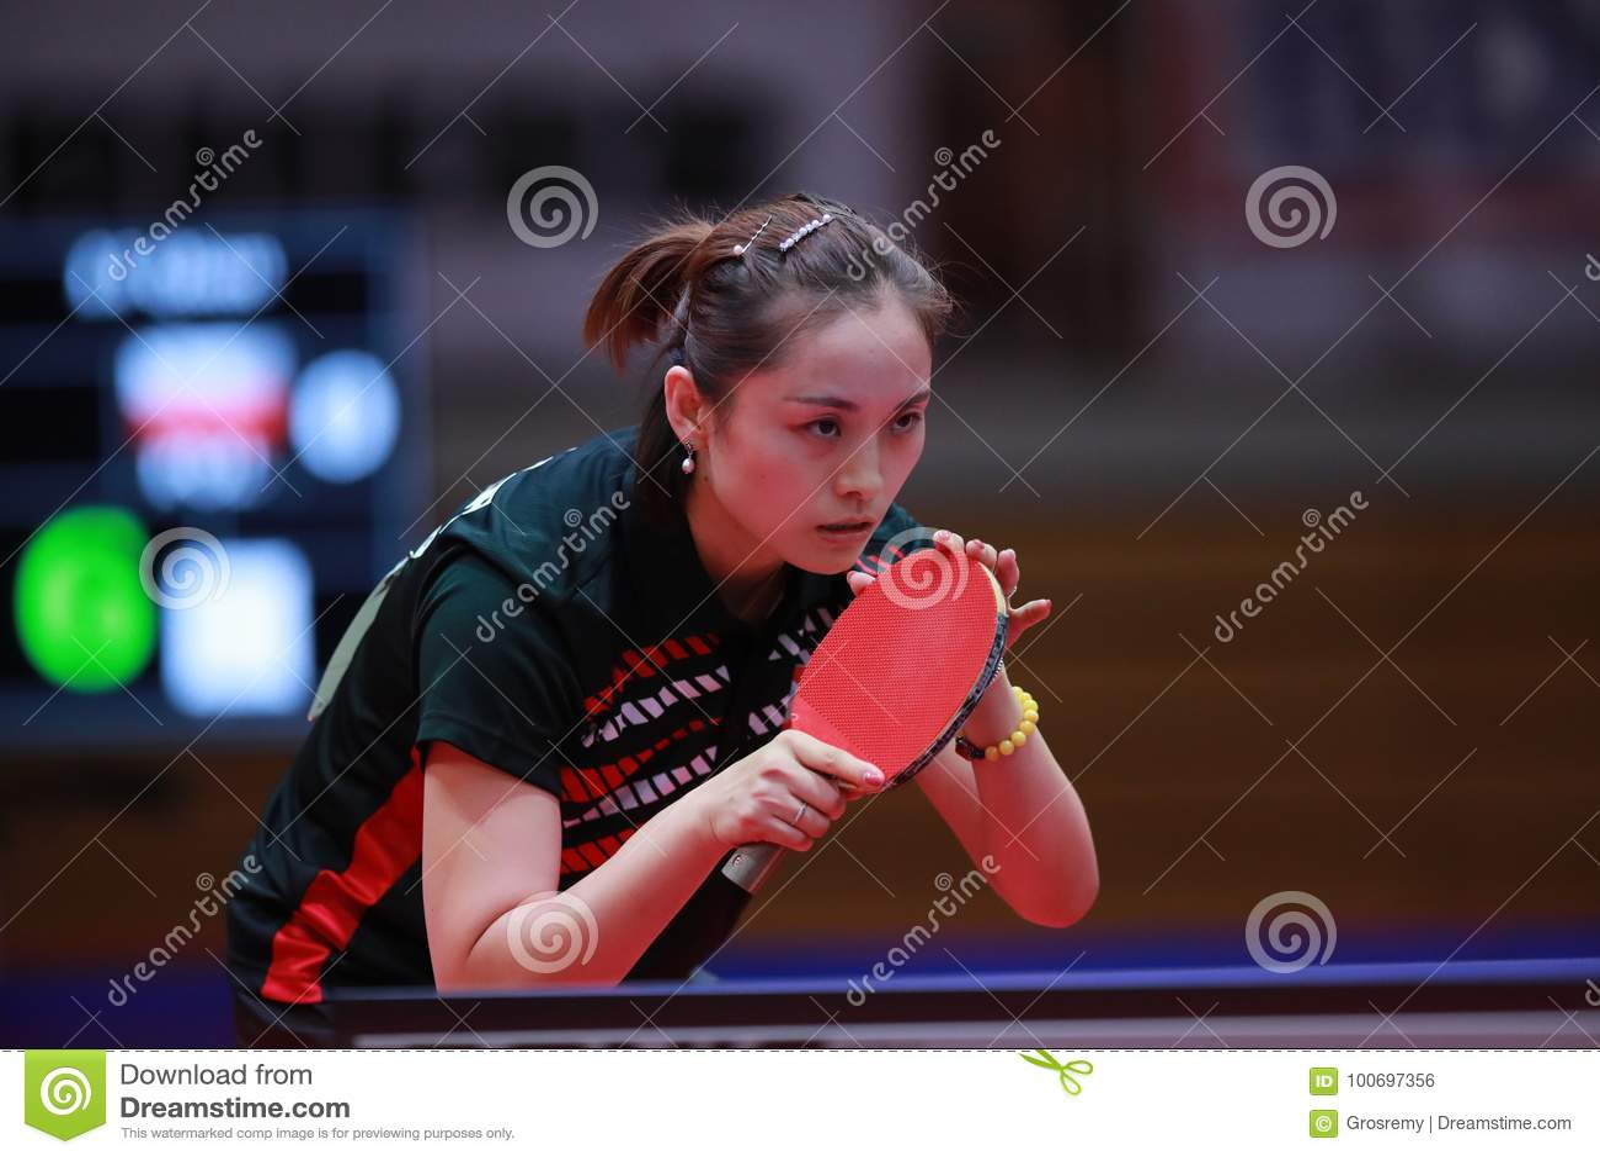 Li Qian Li Qian new photo